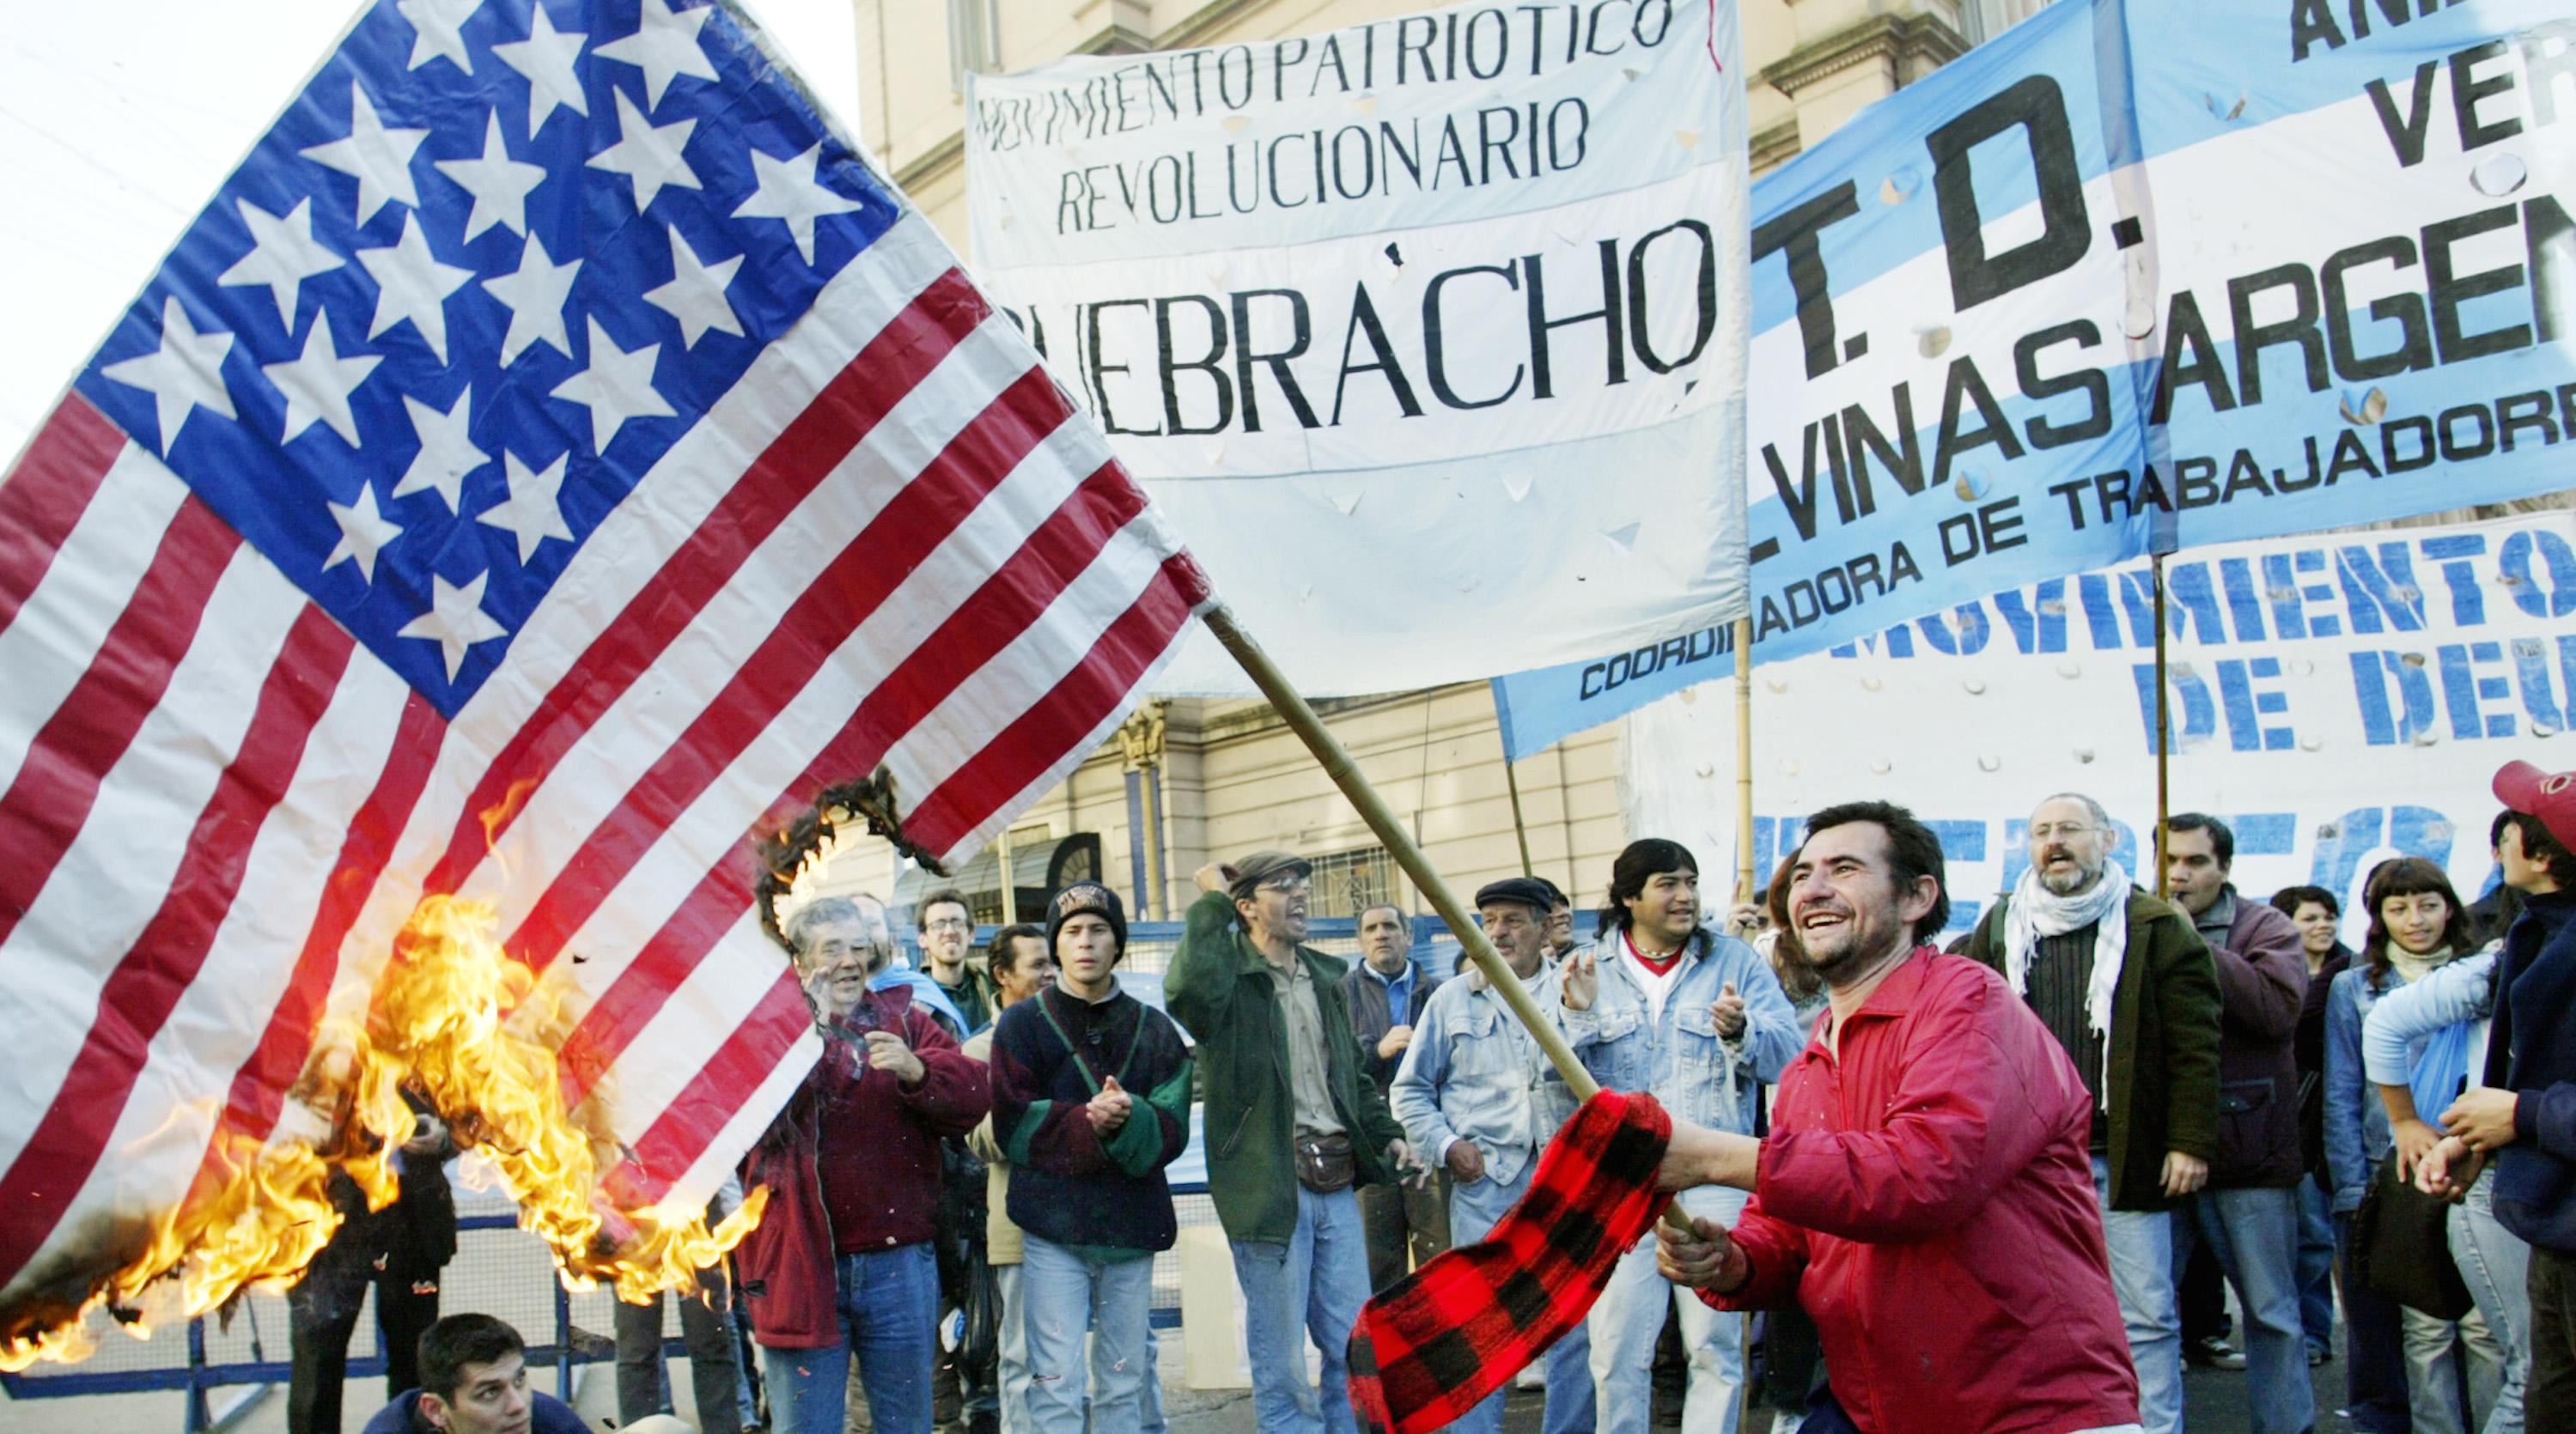 DEMONSTRATORS BURN A US FLAG PROTESTING AGAINST IMF VISIT TO ARGENTINA.